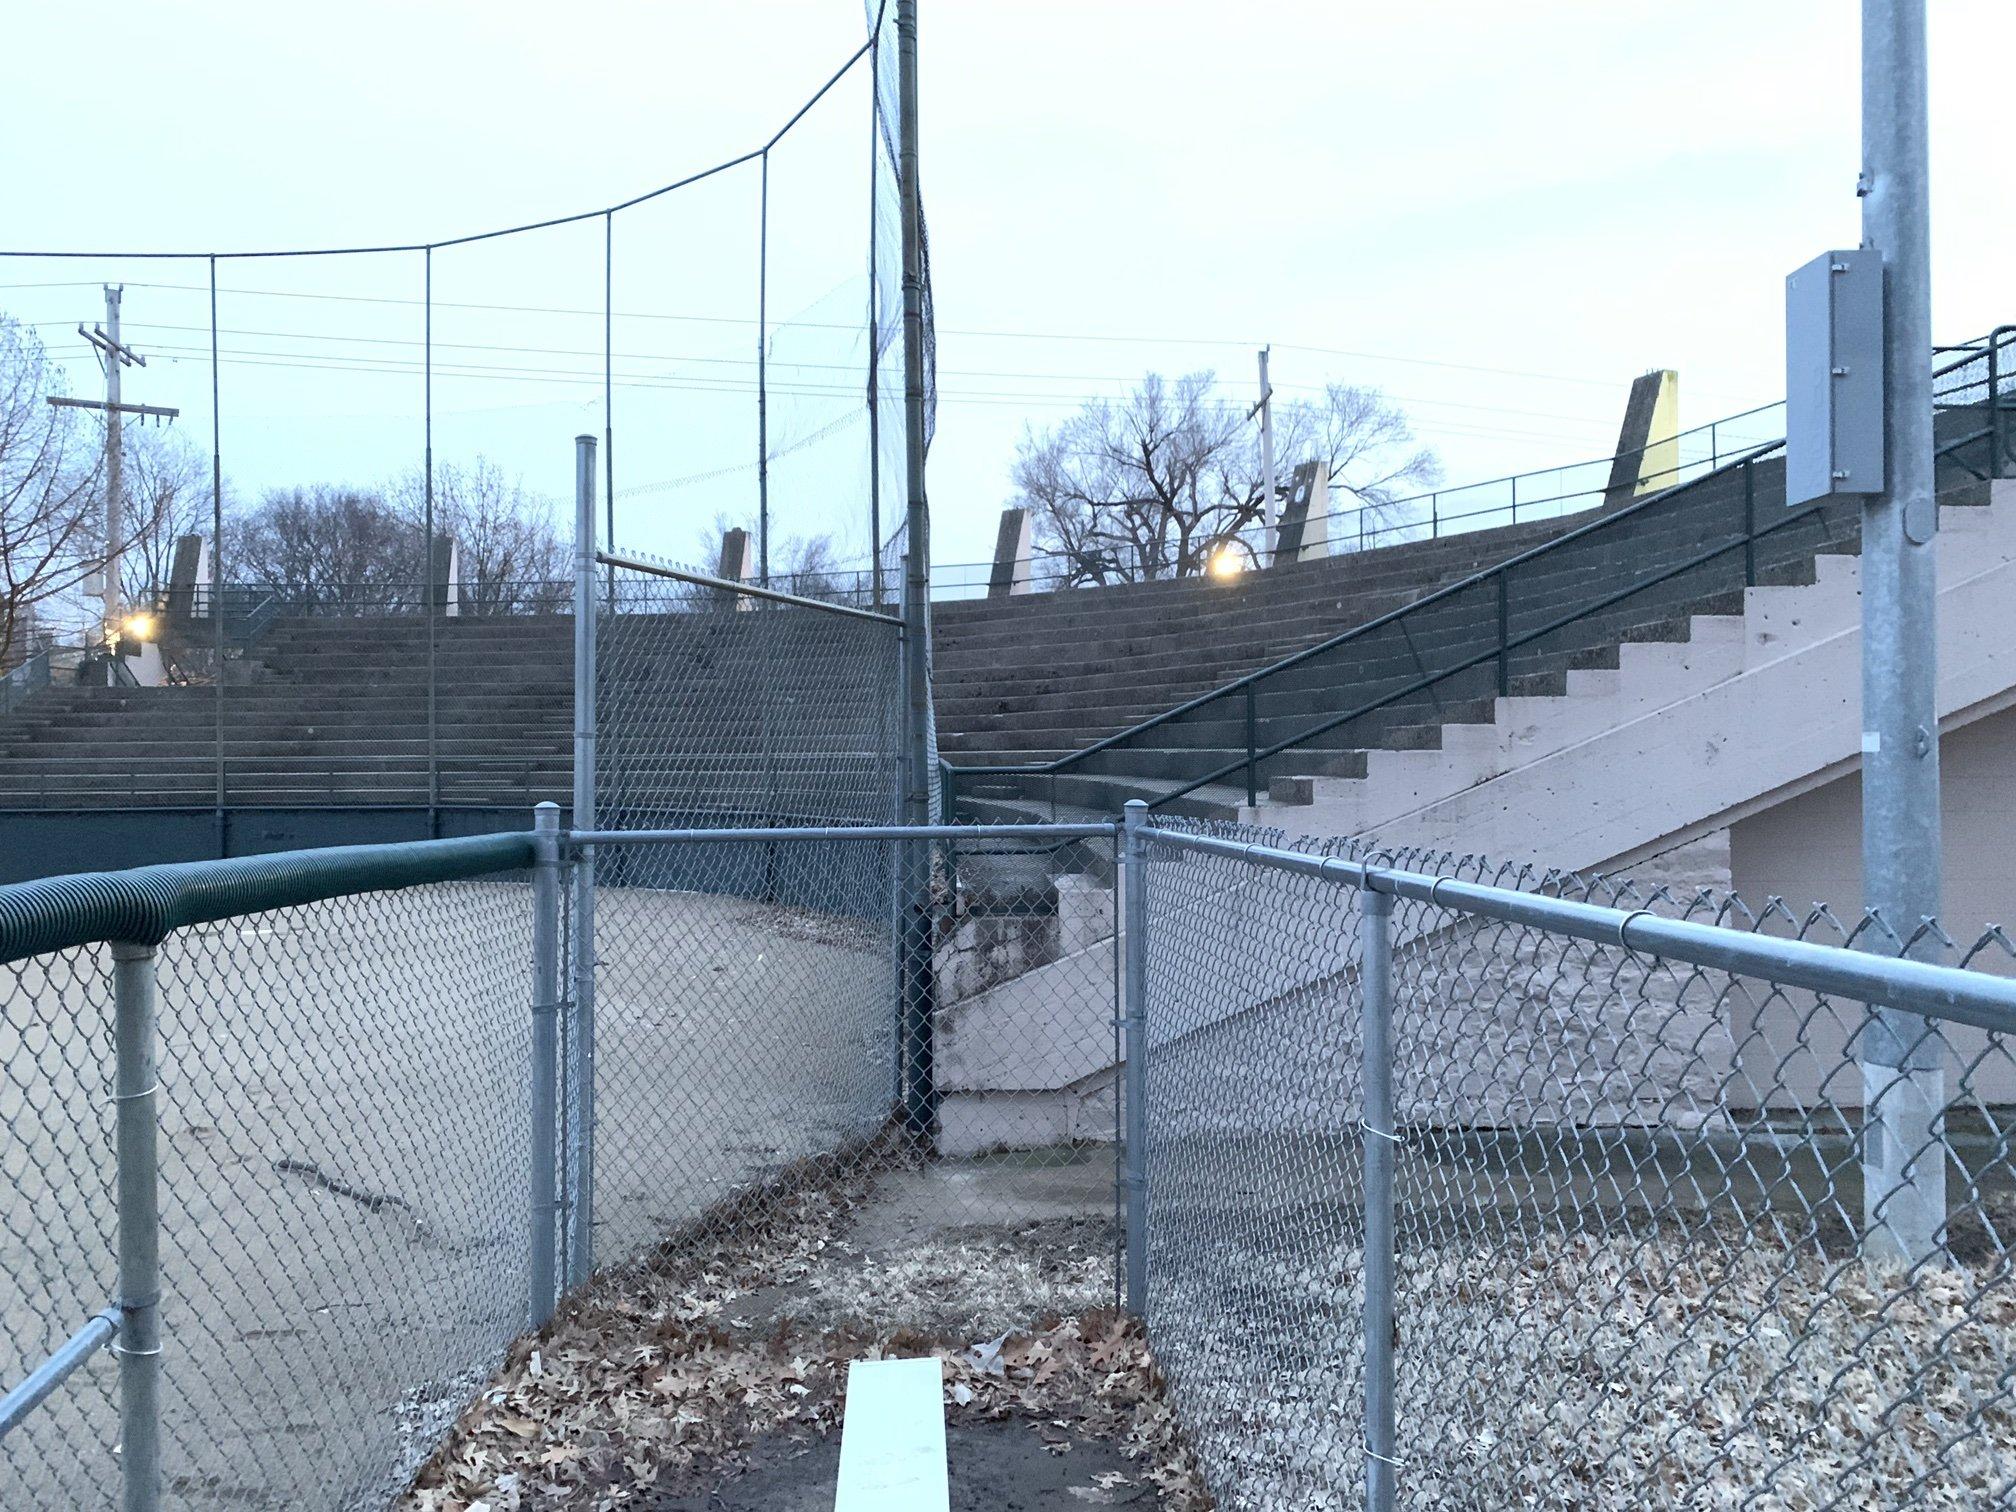 The seating at the baseball stadium.